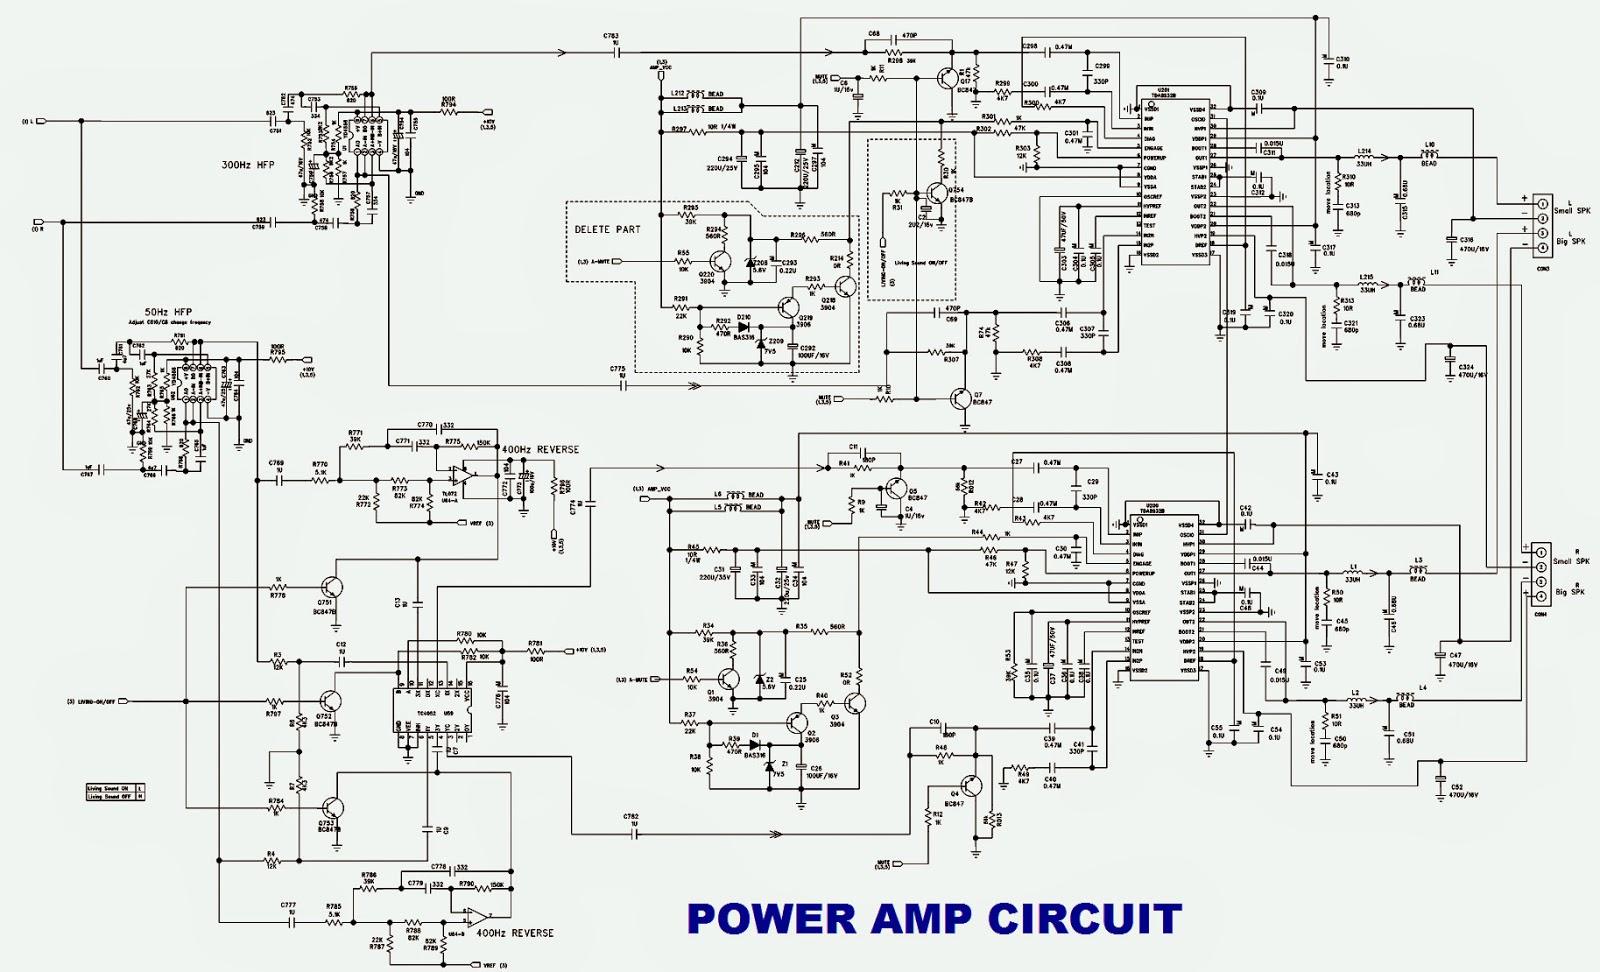 mcm-330 micro hi-fi system - philips